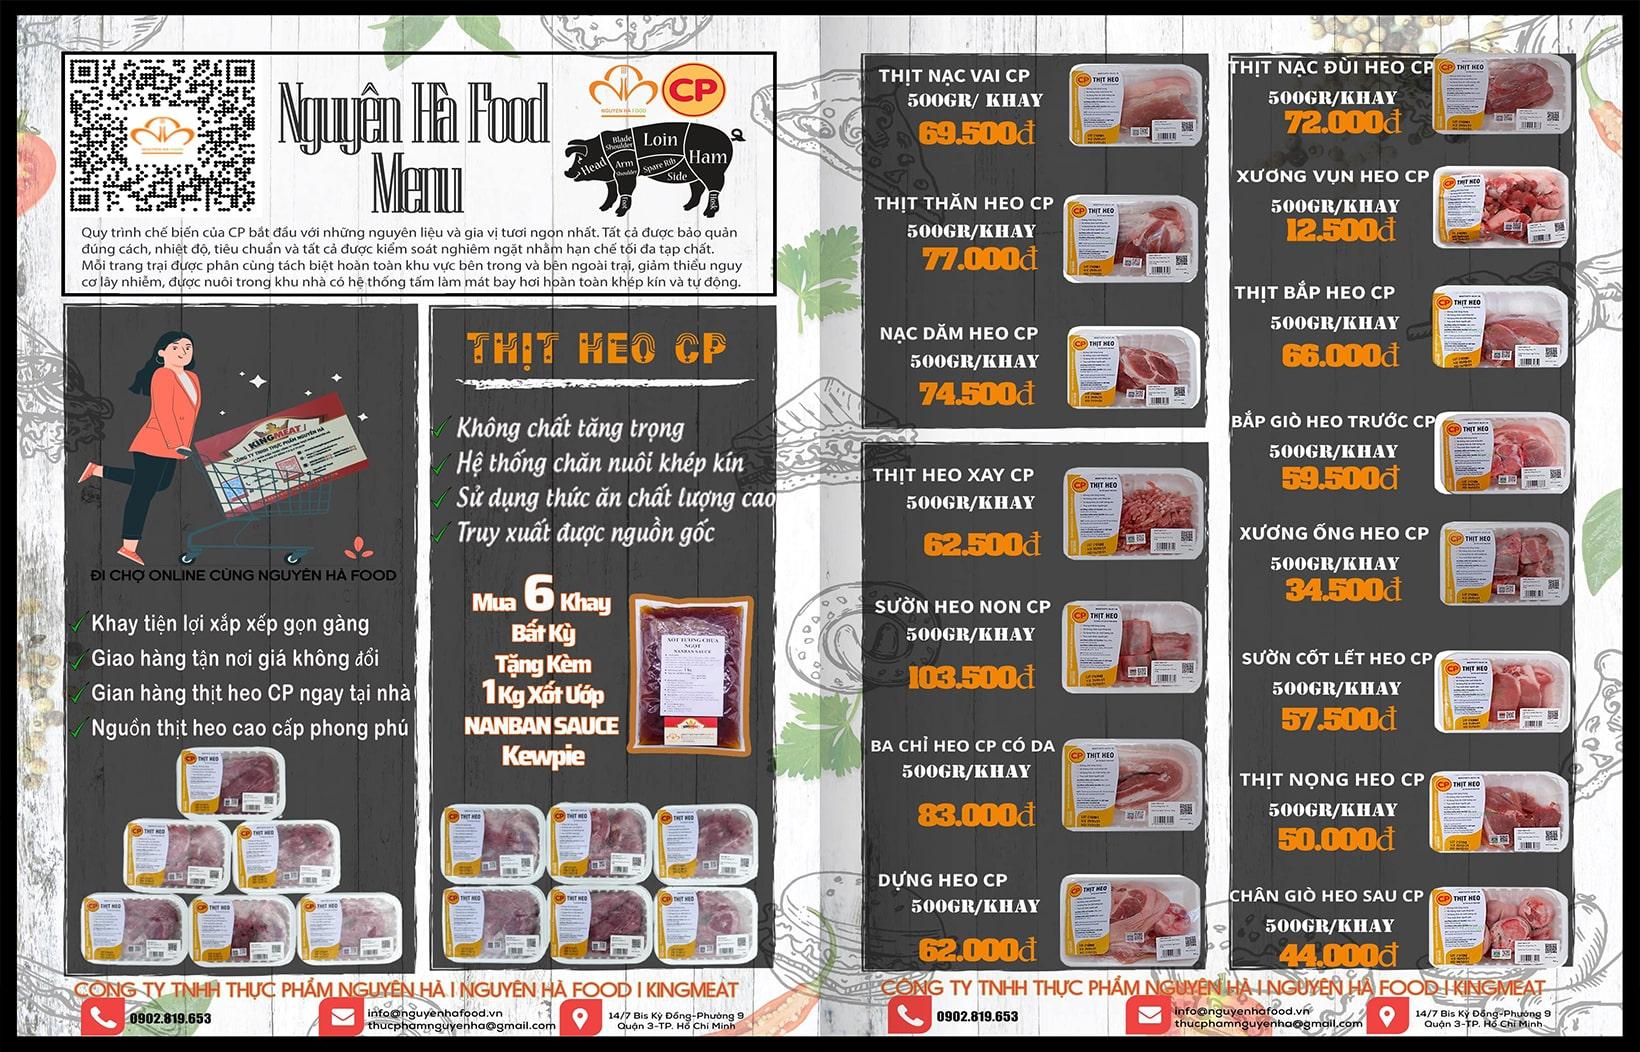 mua-thit-heo-cp-online-nhan-ngay-khuyen-mai-xot-nanban-sauce-kewpie-min